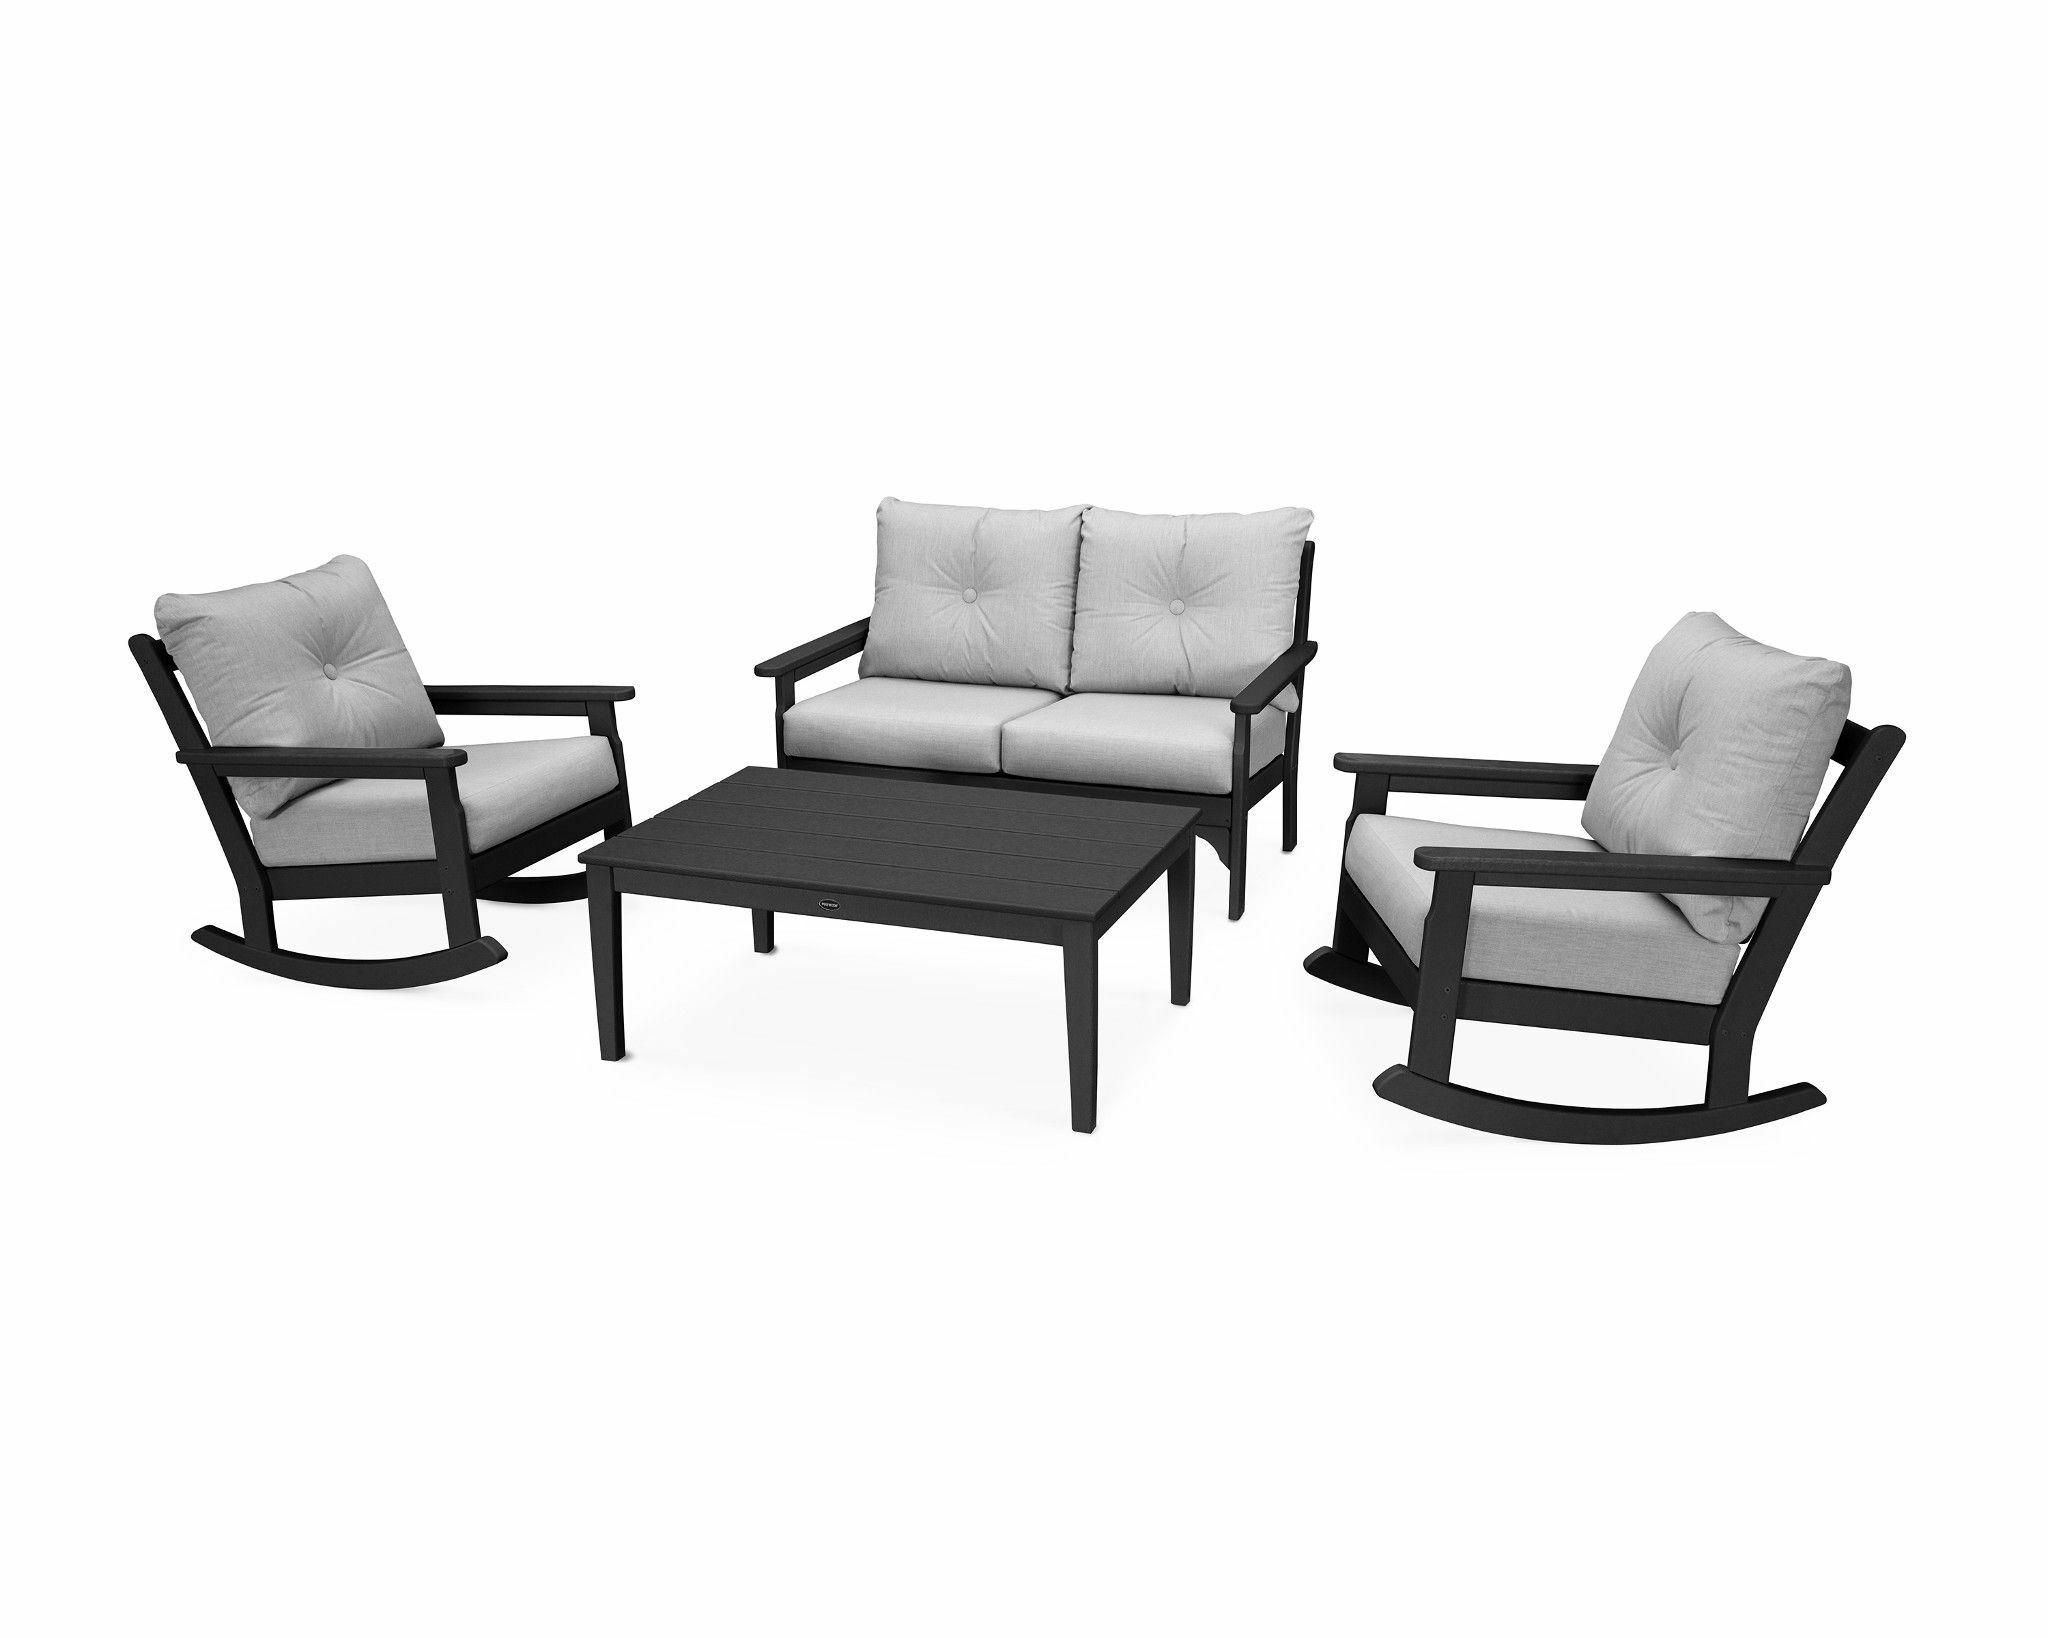 Vineyard 4 Piece Sofa Set with Sunbrella Cushions Frame Finish: Green, Fabric: Sesame